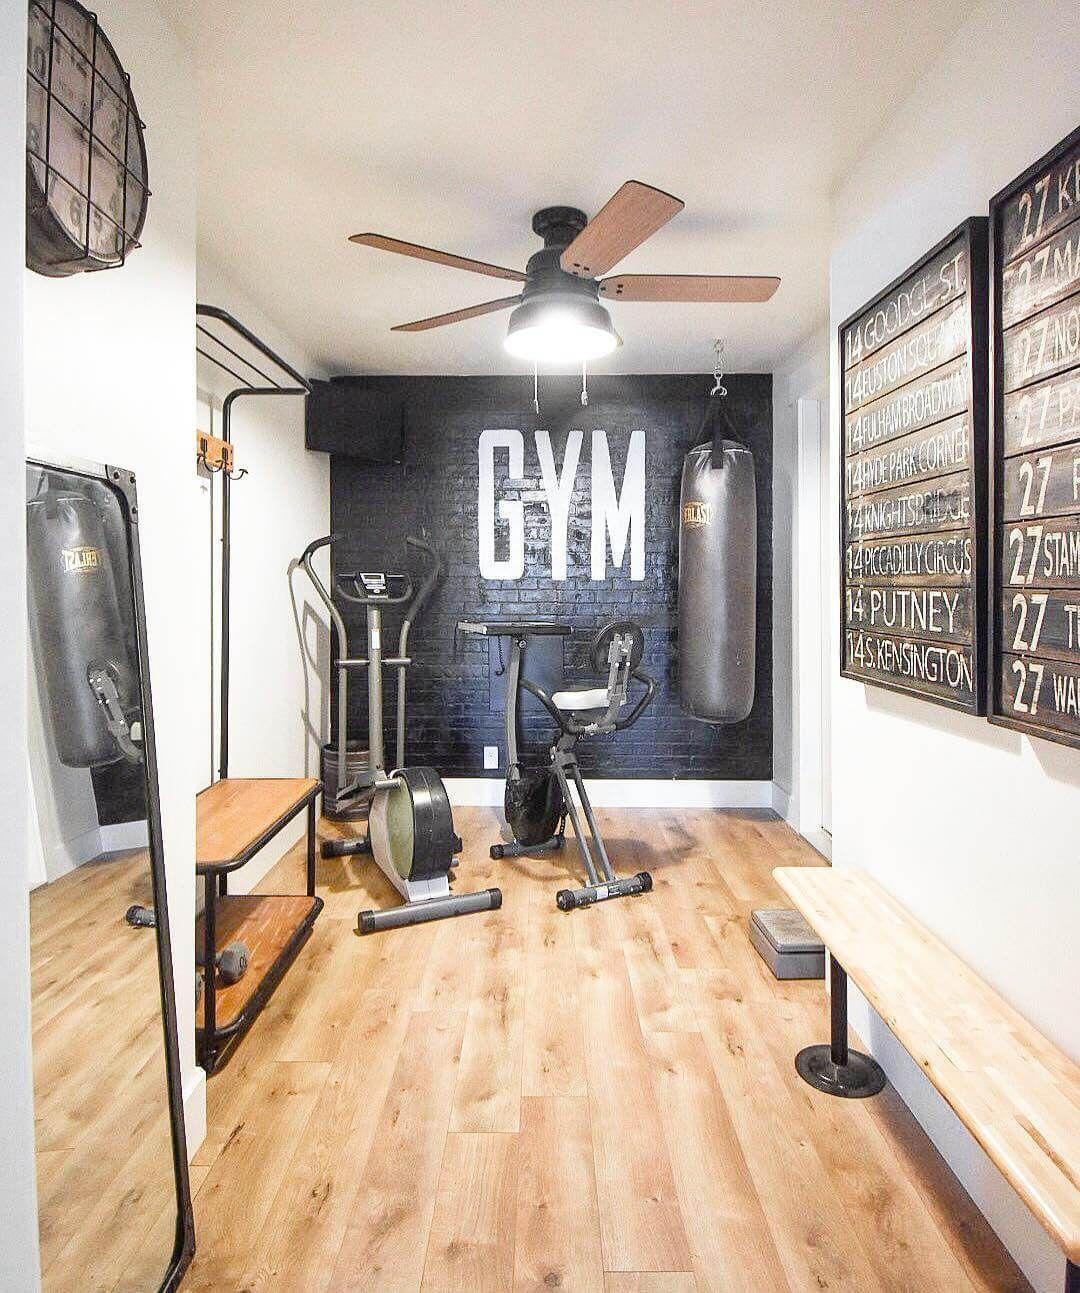 Home Gym Design Ideas Basement: Demian Dashton Blog Get All Ideas About Home